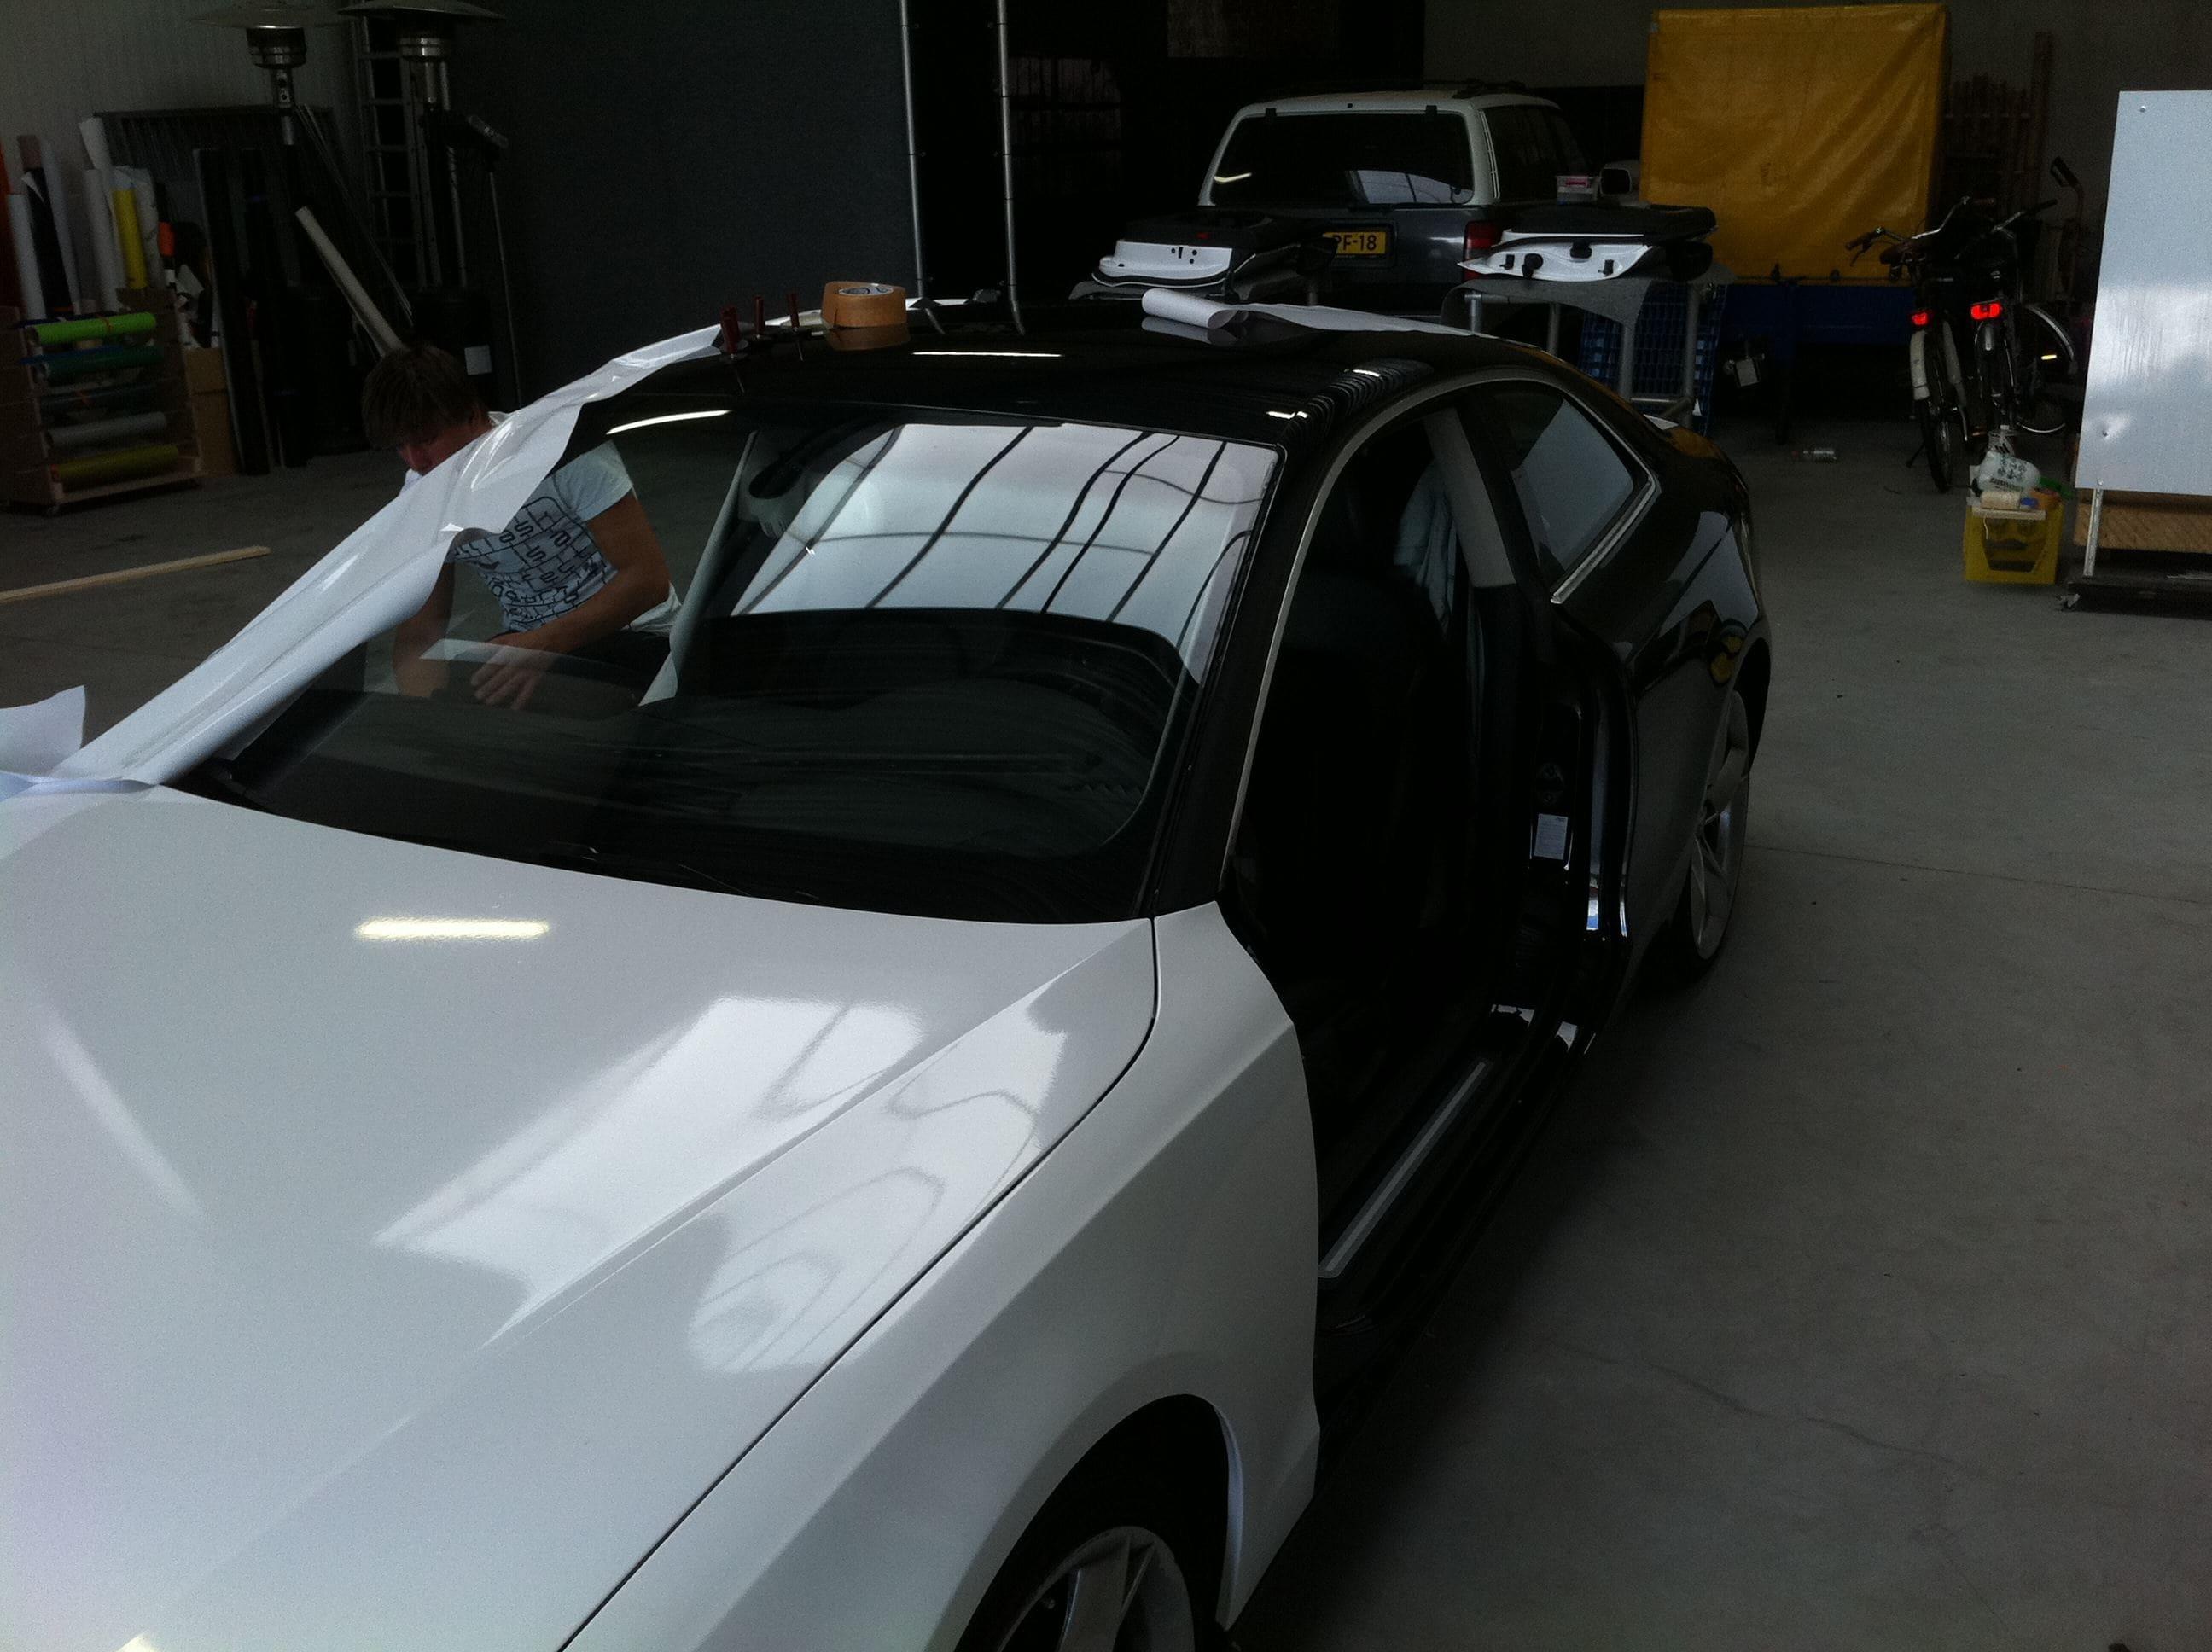 Audi A5 coupe met Metallic Witte Wrap, Carwrapping door Wrapmyride.nu Foto-nr:4664, ©2021